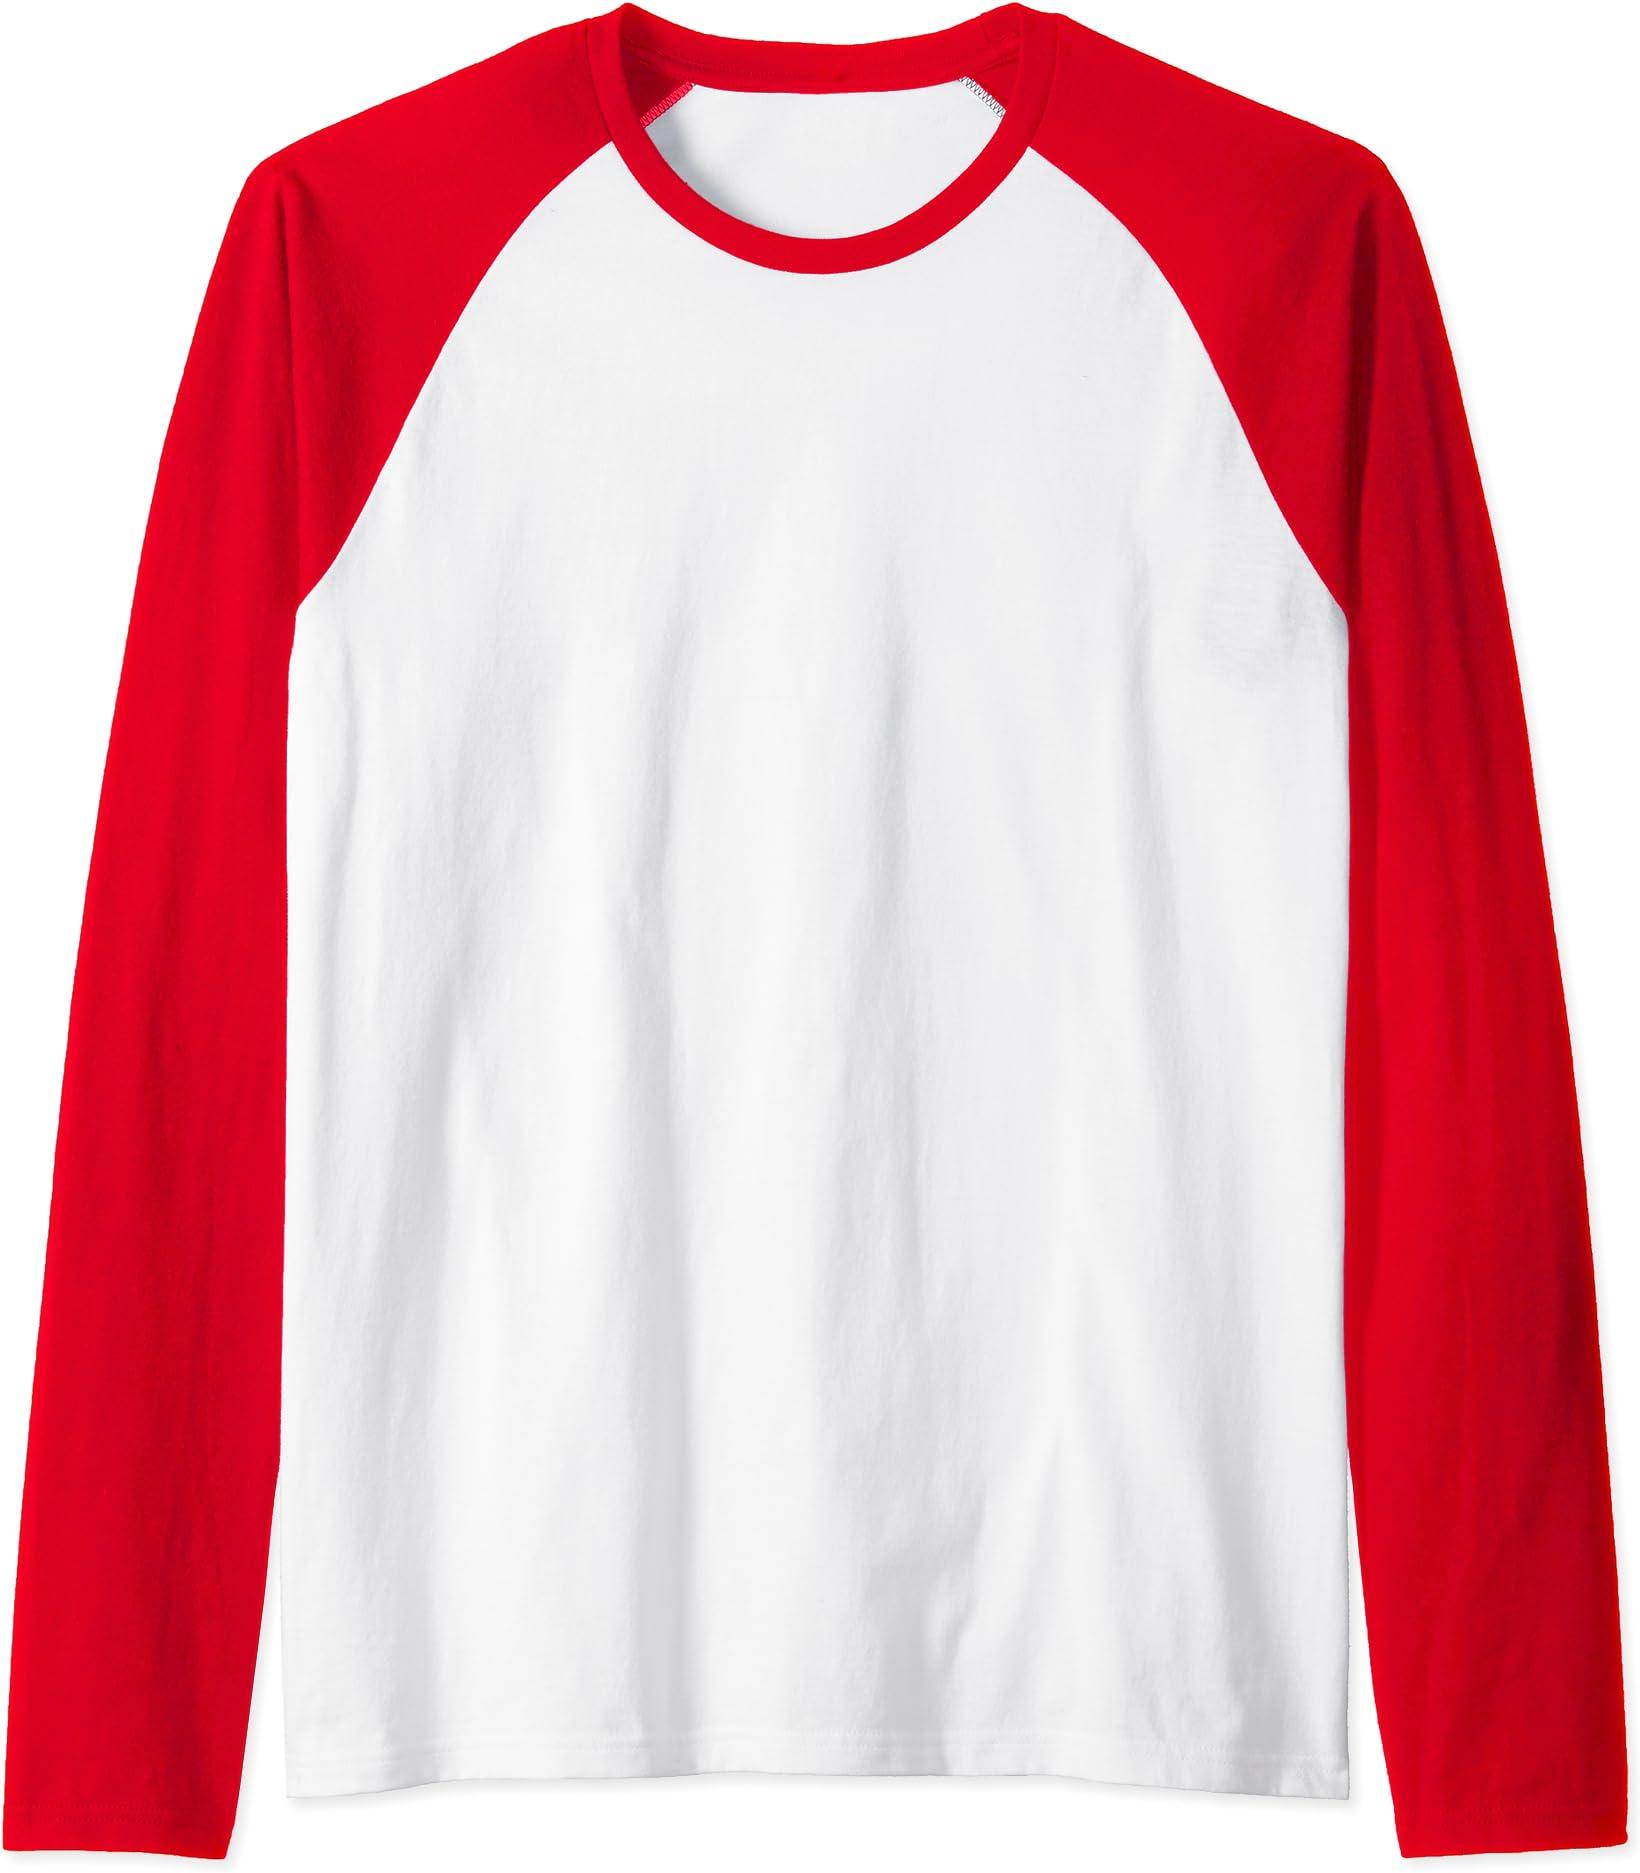 Star Wars Girls Outlined Sketch Sweatshirt